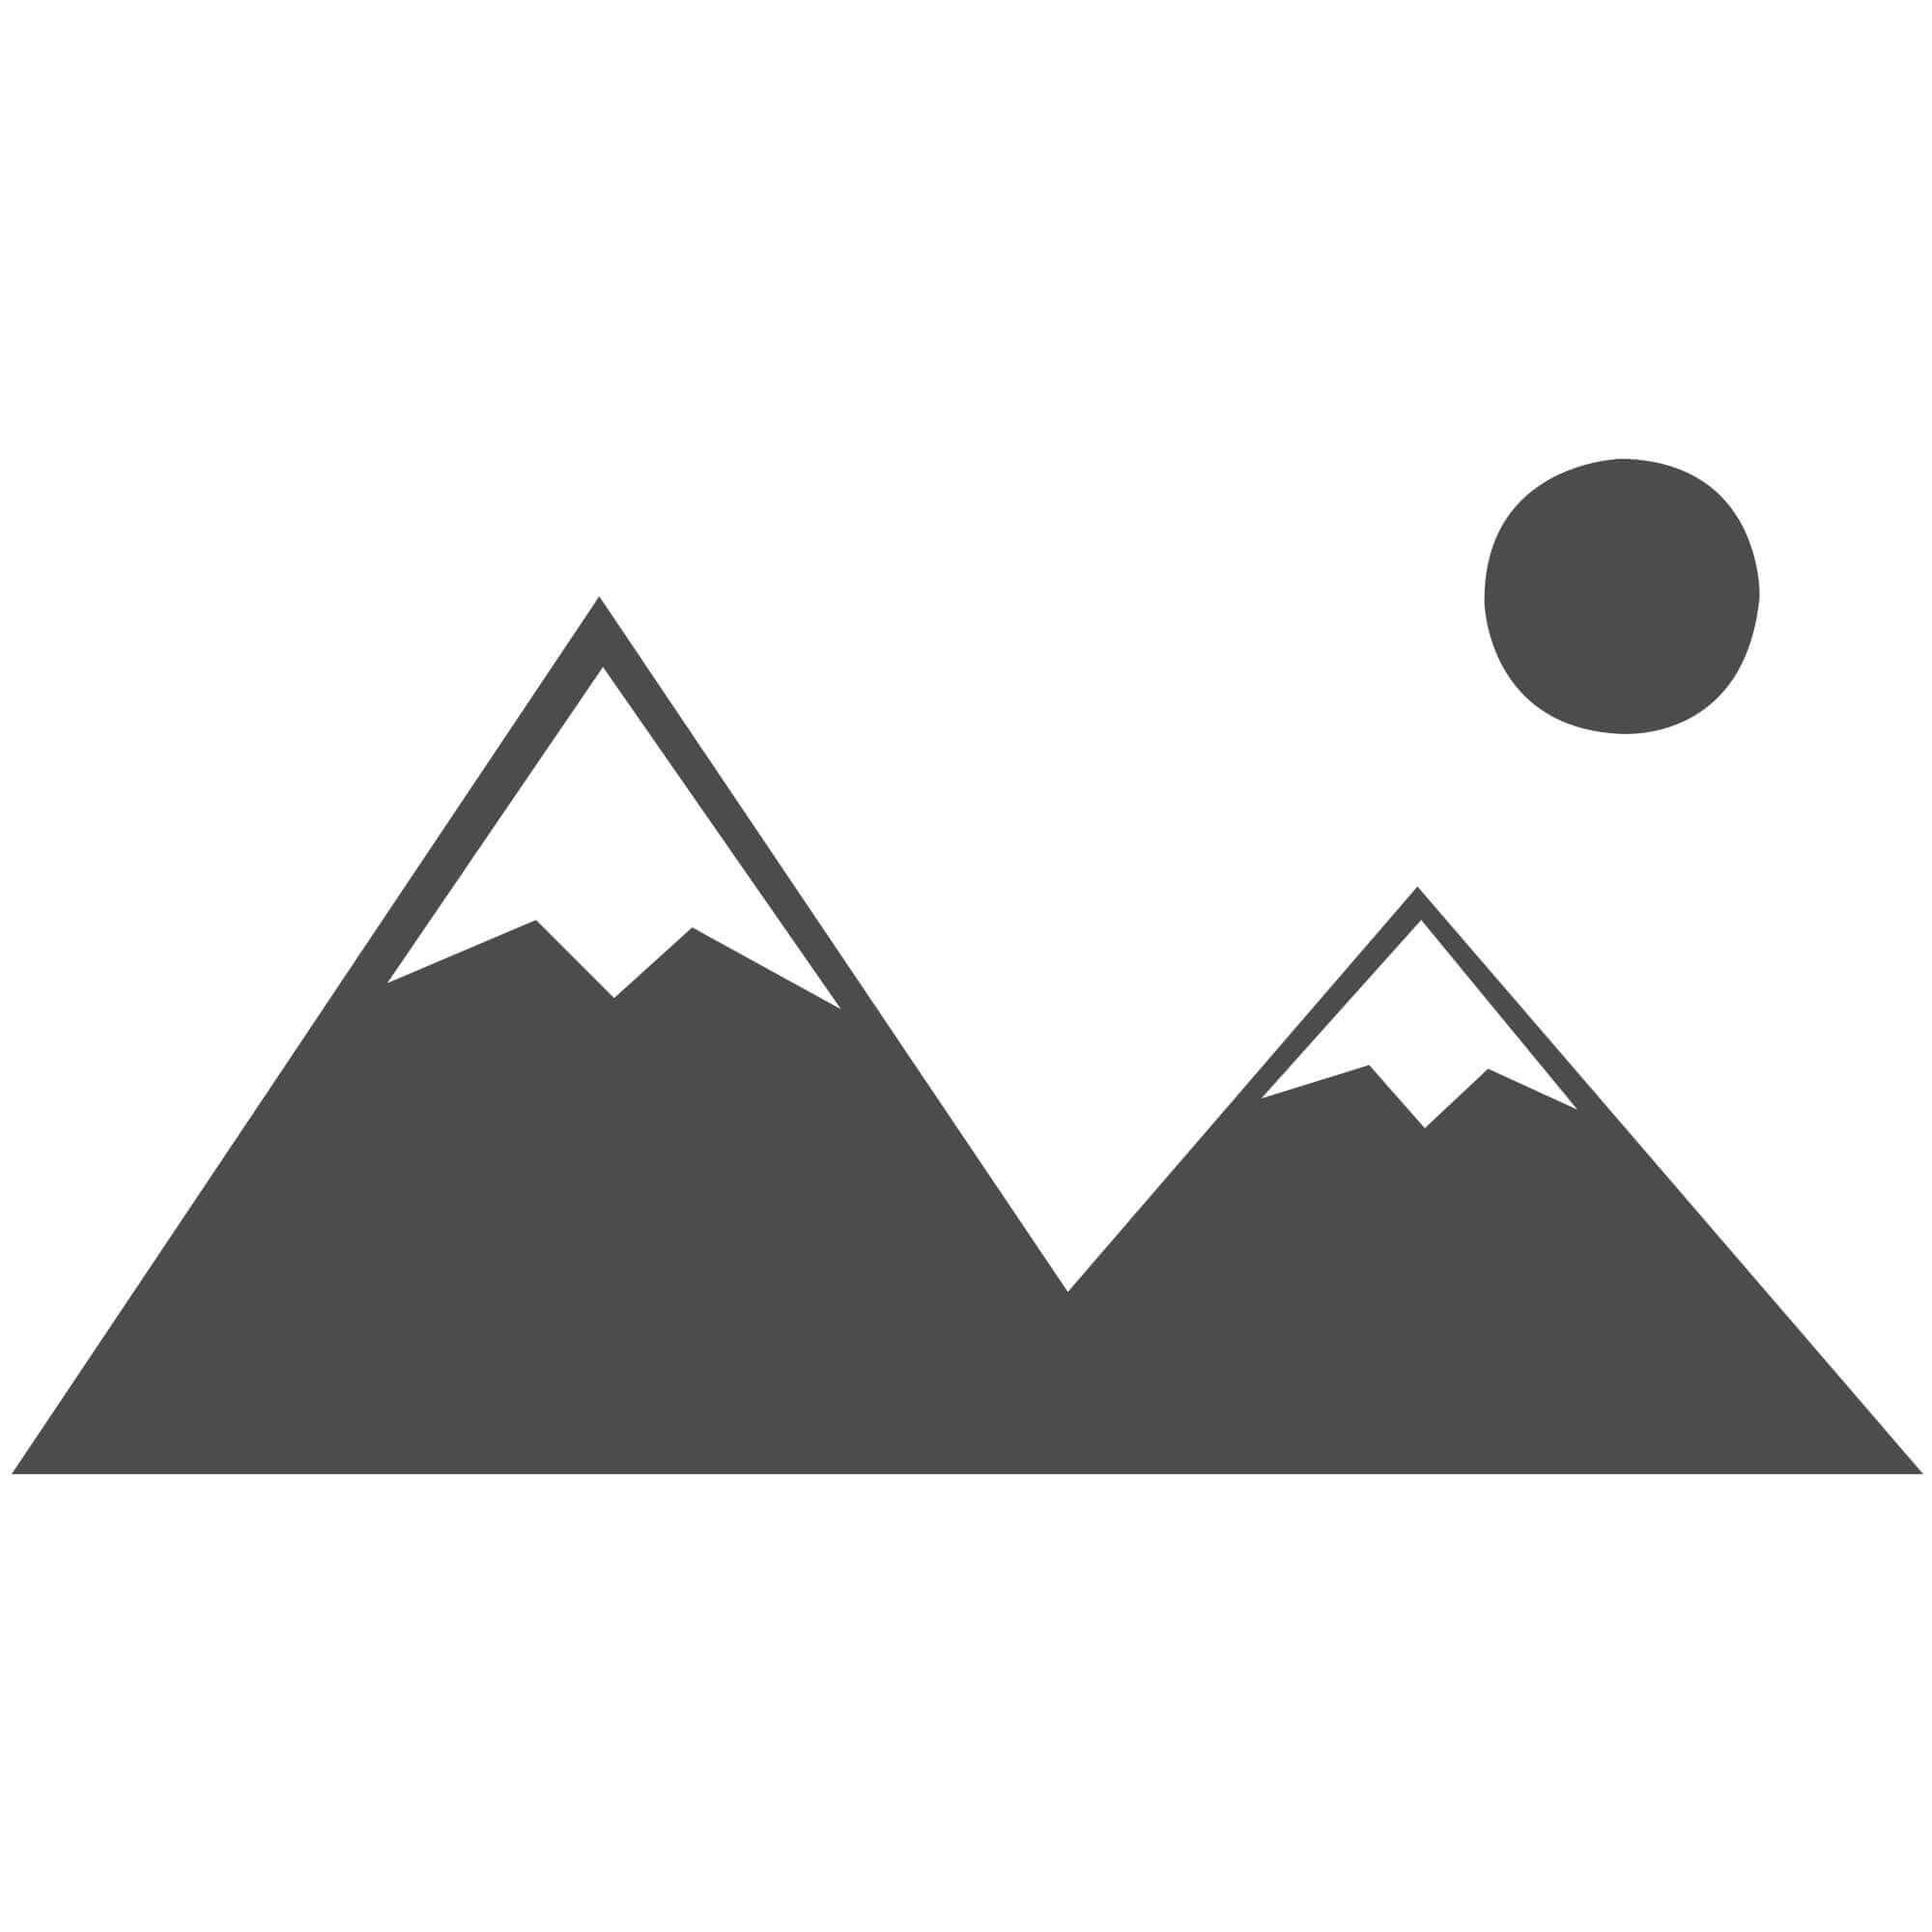 British Sheepskin Rug  - Pink-Octo Skin